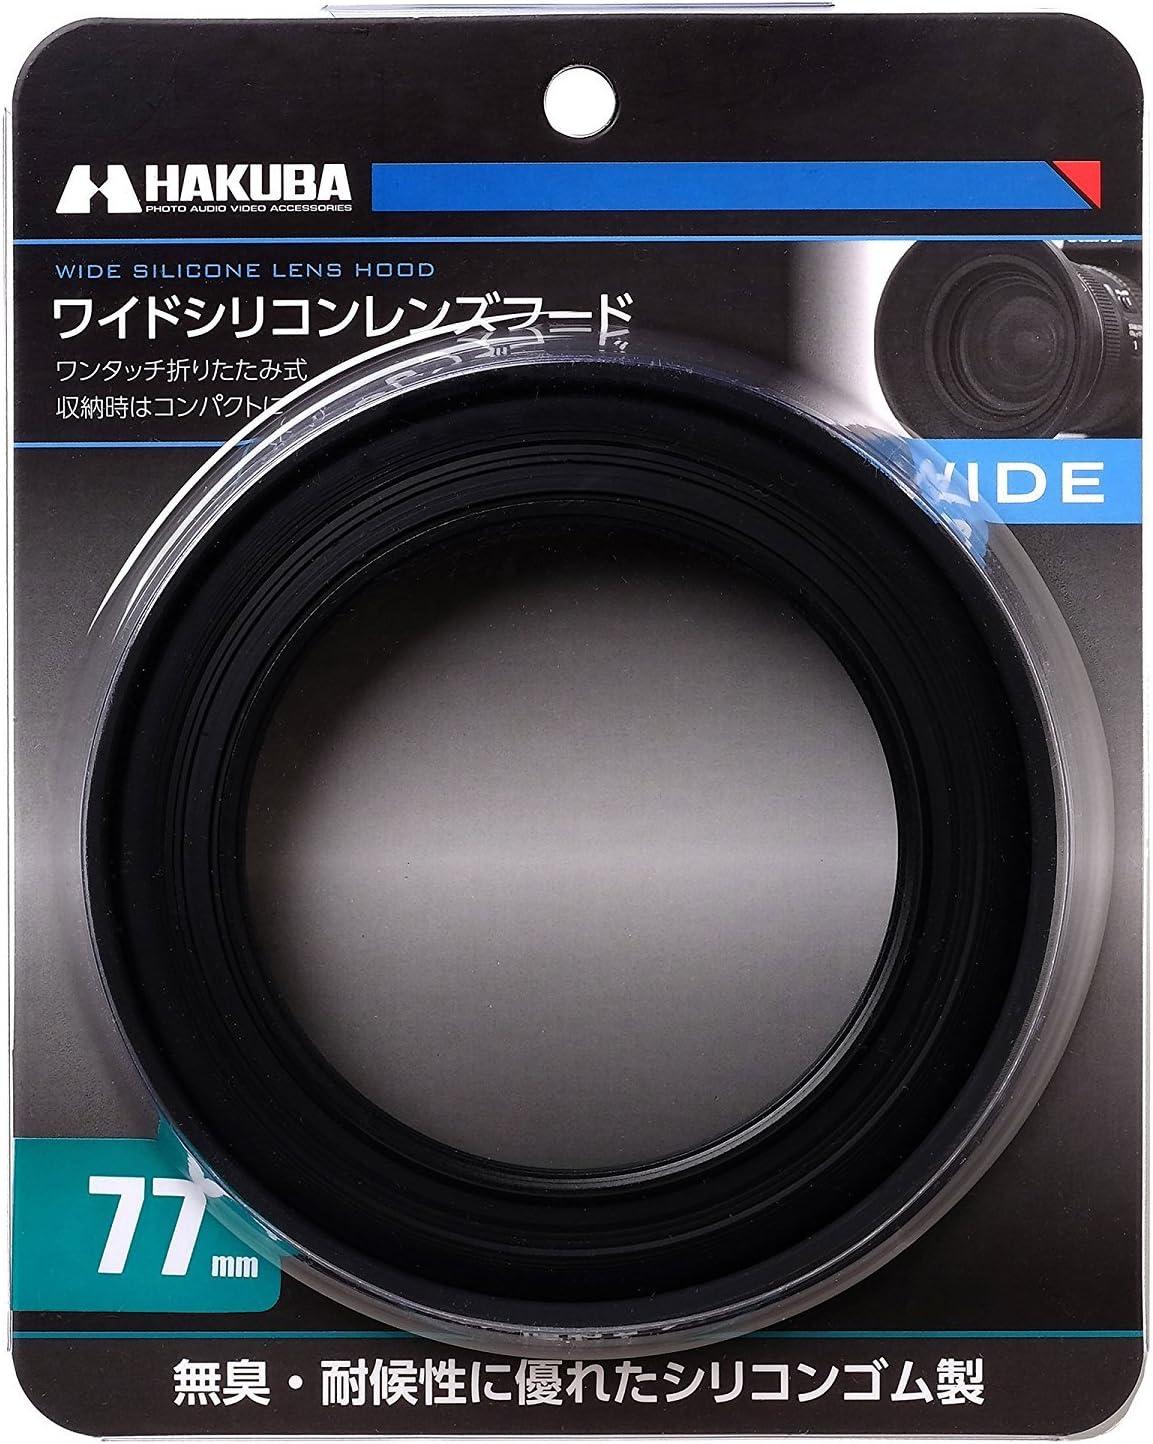 72mm HAKUBA Lens Hood Wide Silicon Lens Hood Folding Filter 径装 wear Black KA-WSLH72